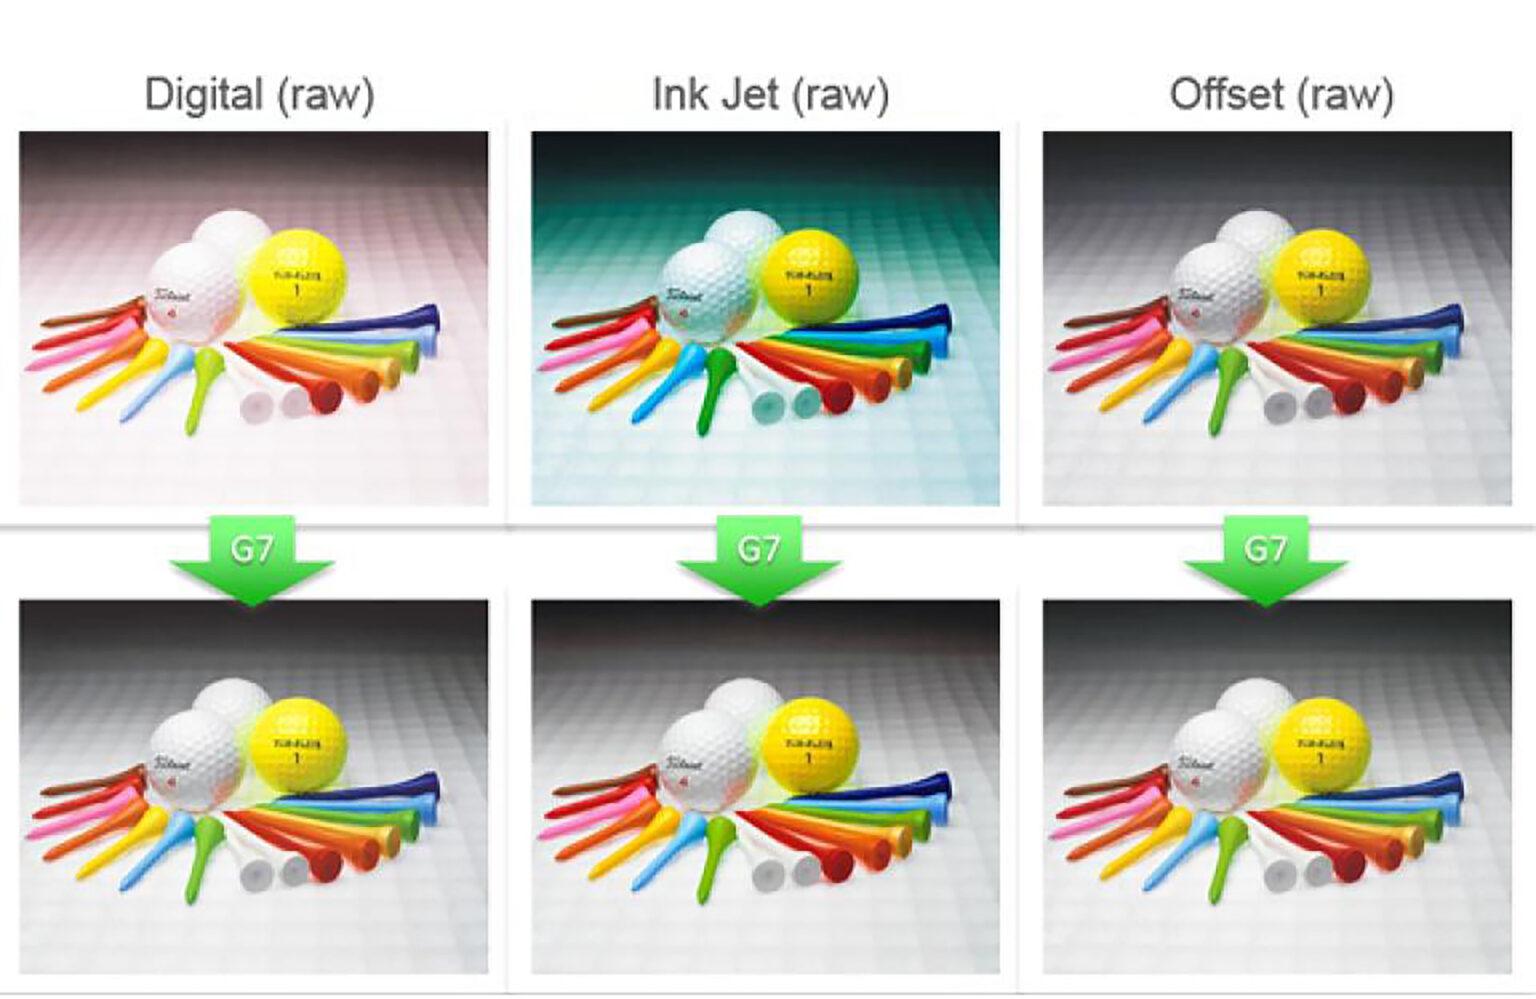 G7 image vs raw image